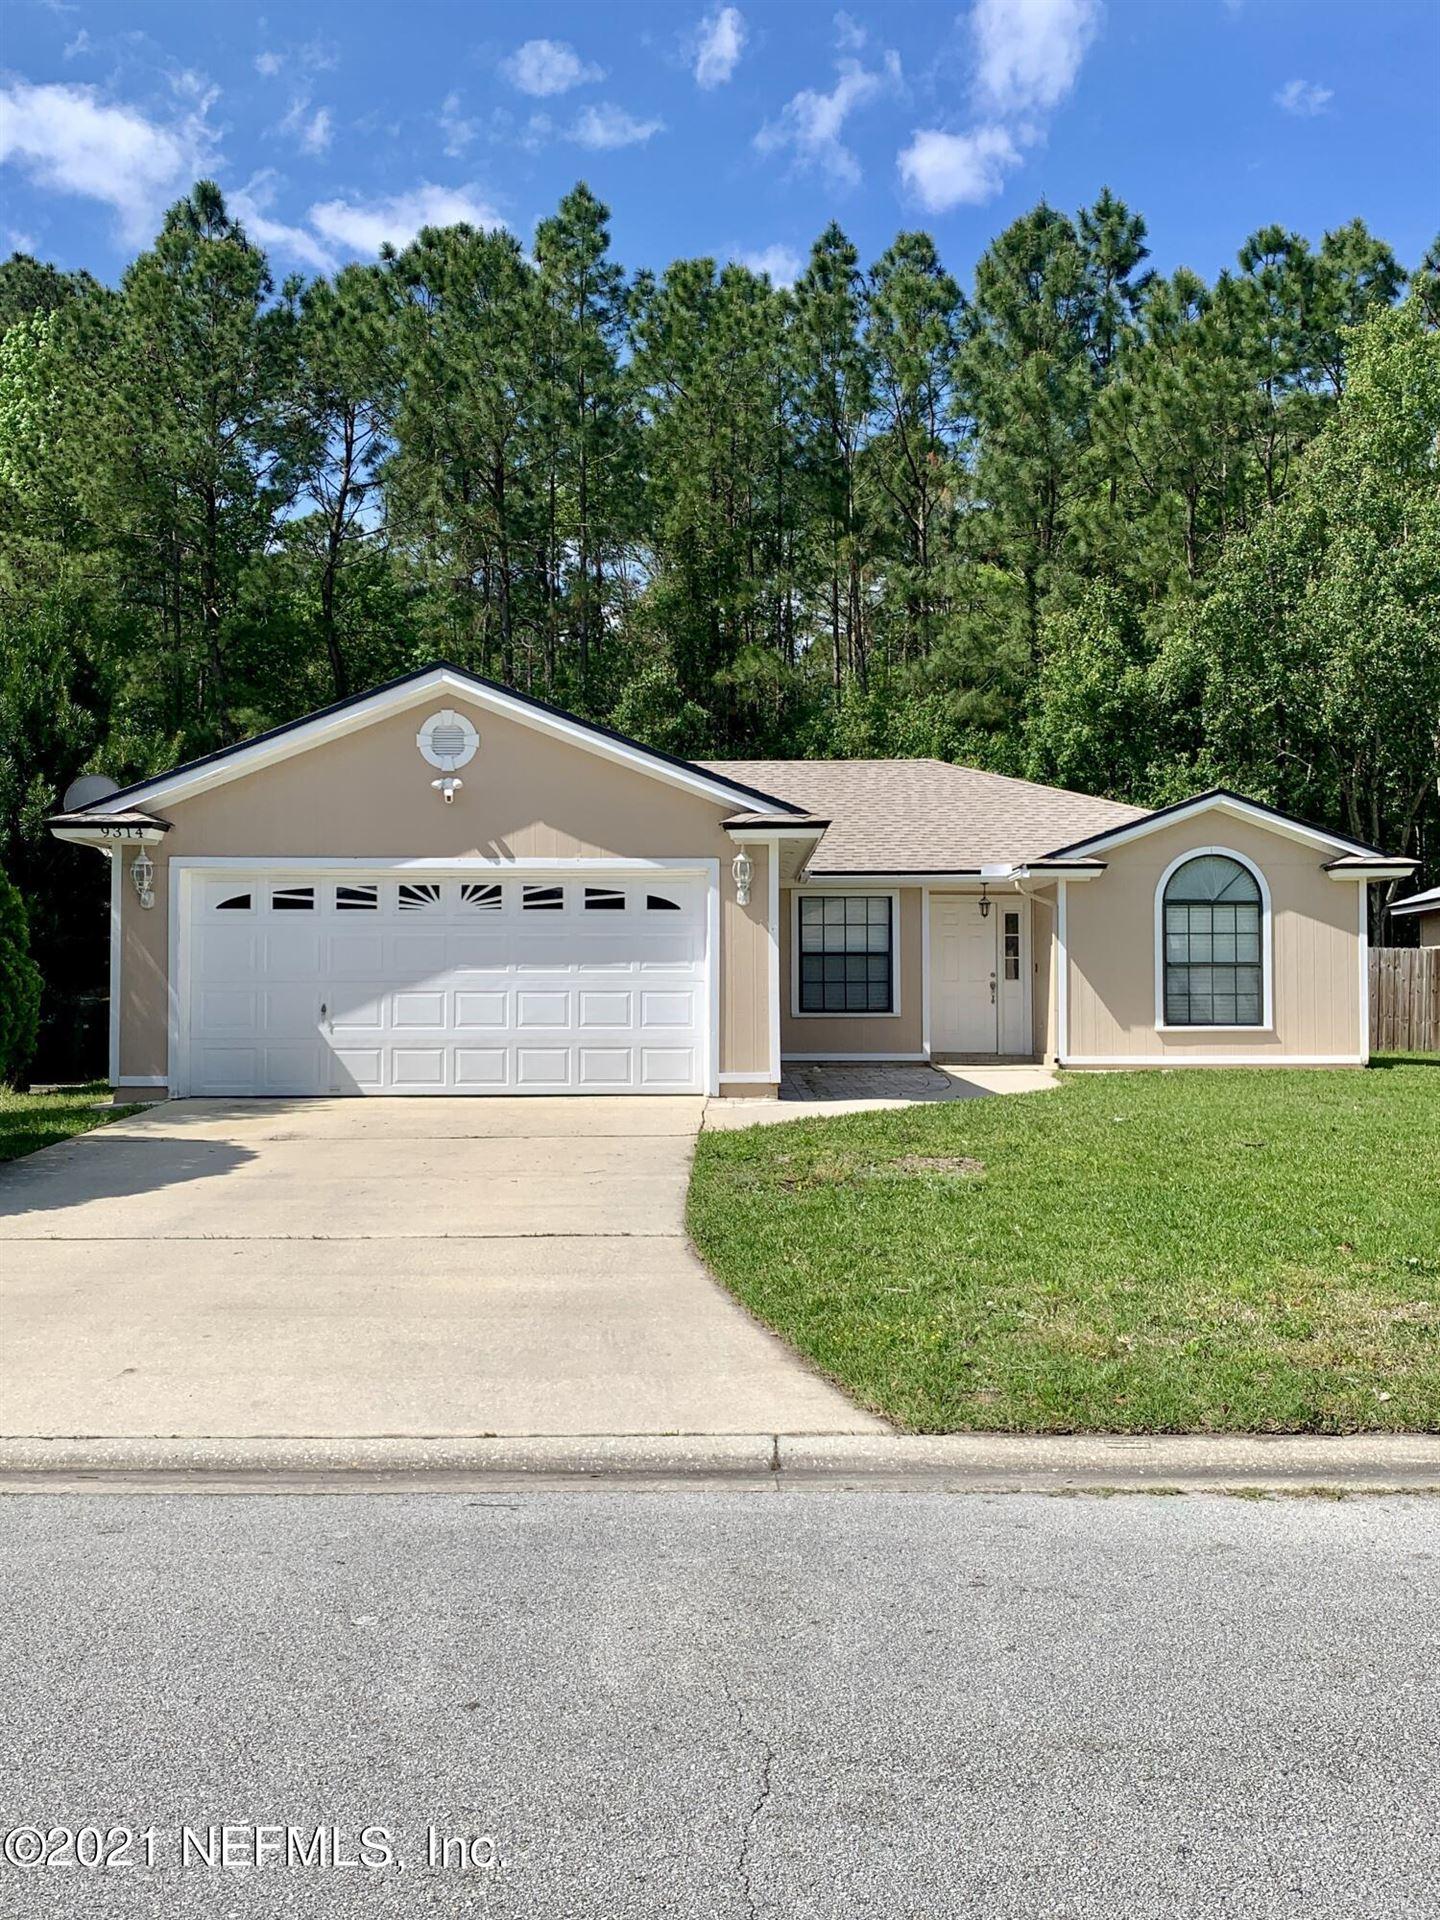 9314 CUMBERLAND STATION DR #Lot No: 1487021255, Jacksonville, FL 32257 - MLS#: 1101916